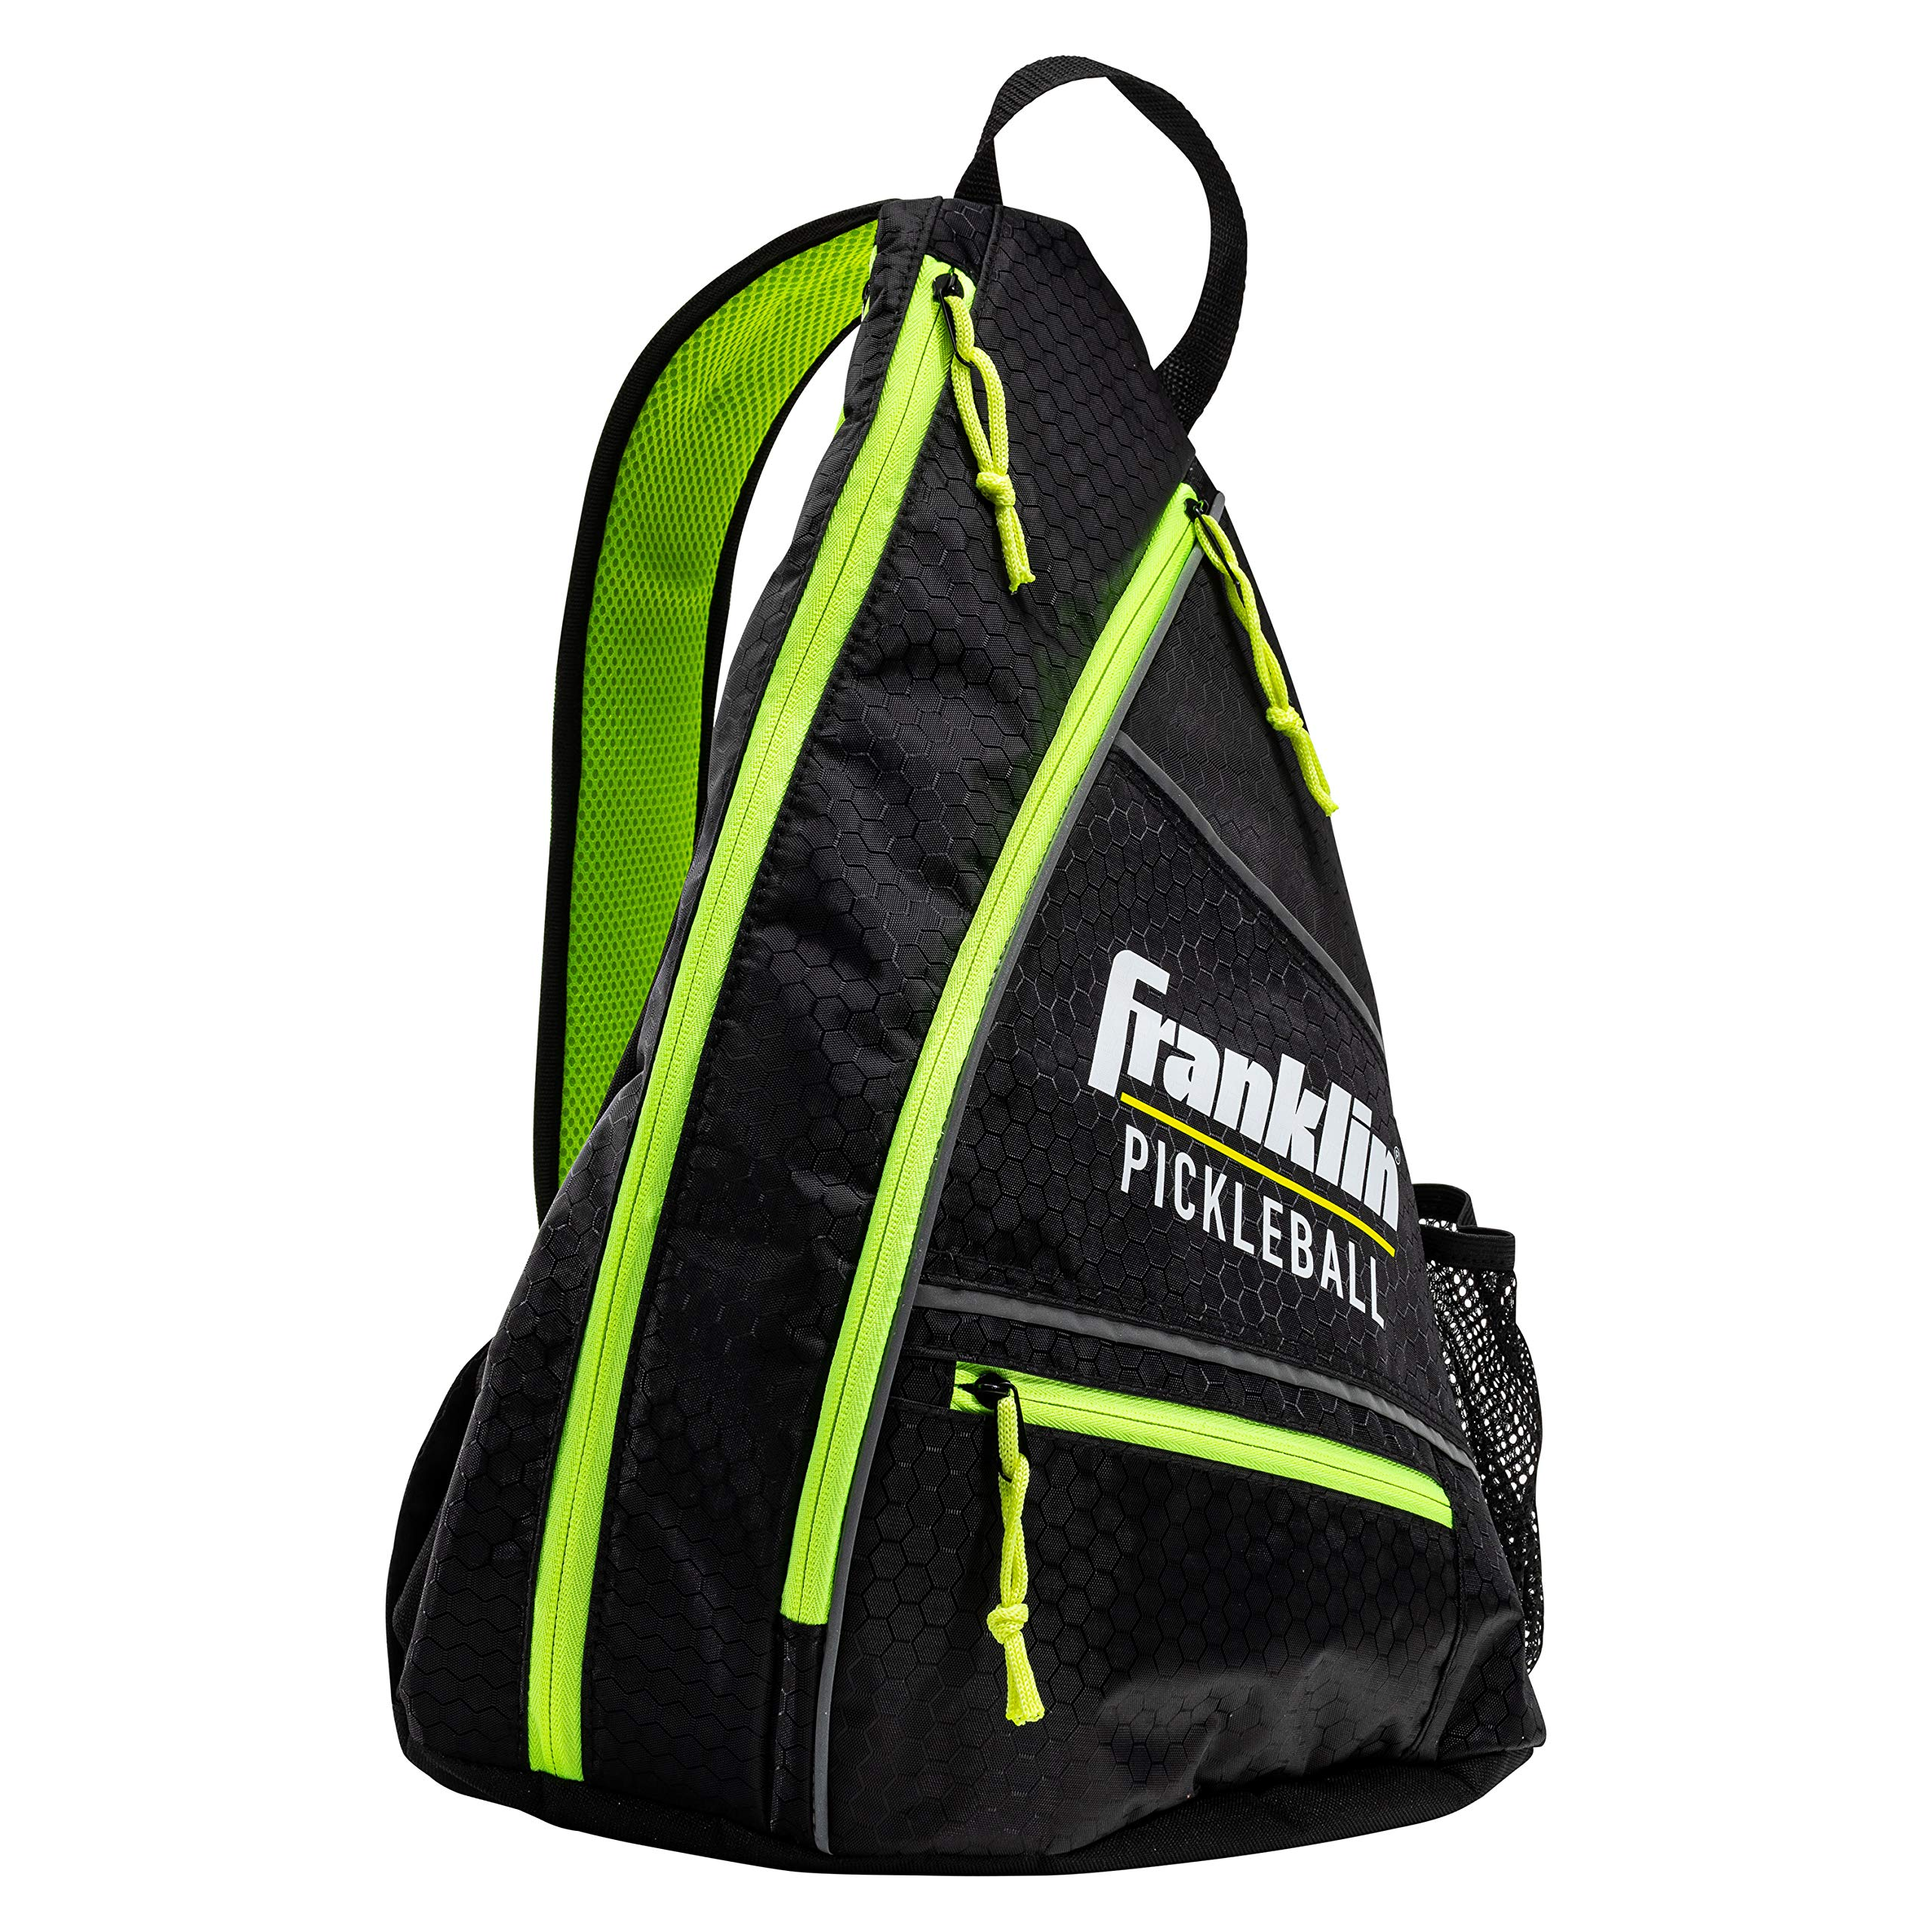 Franklin Sports Pickleball Bag - Men's and Women's Pickleball Backpack - Adjustable Sling Bag - Official Bag of U.S Open Pickleball Championships - Black/Optic by Franklin Sports